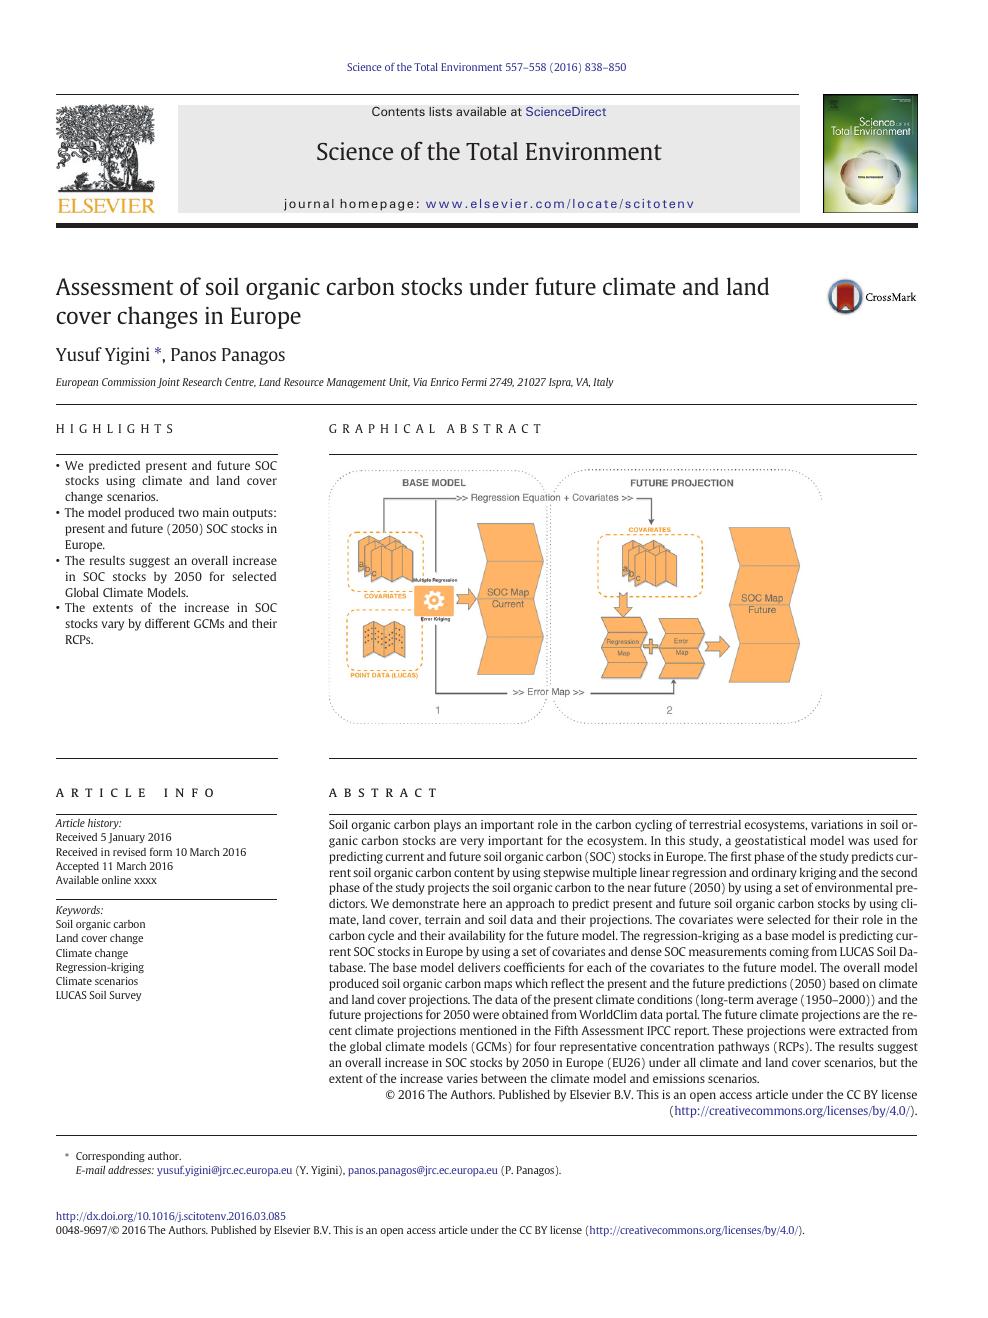 Assessment of soil organic carbon stocks under future